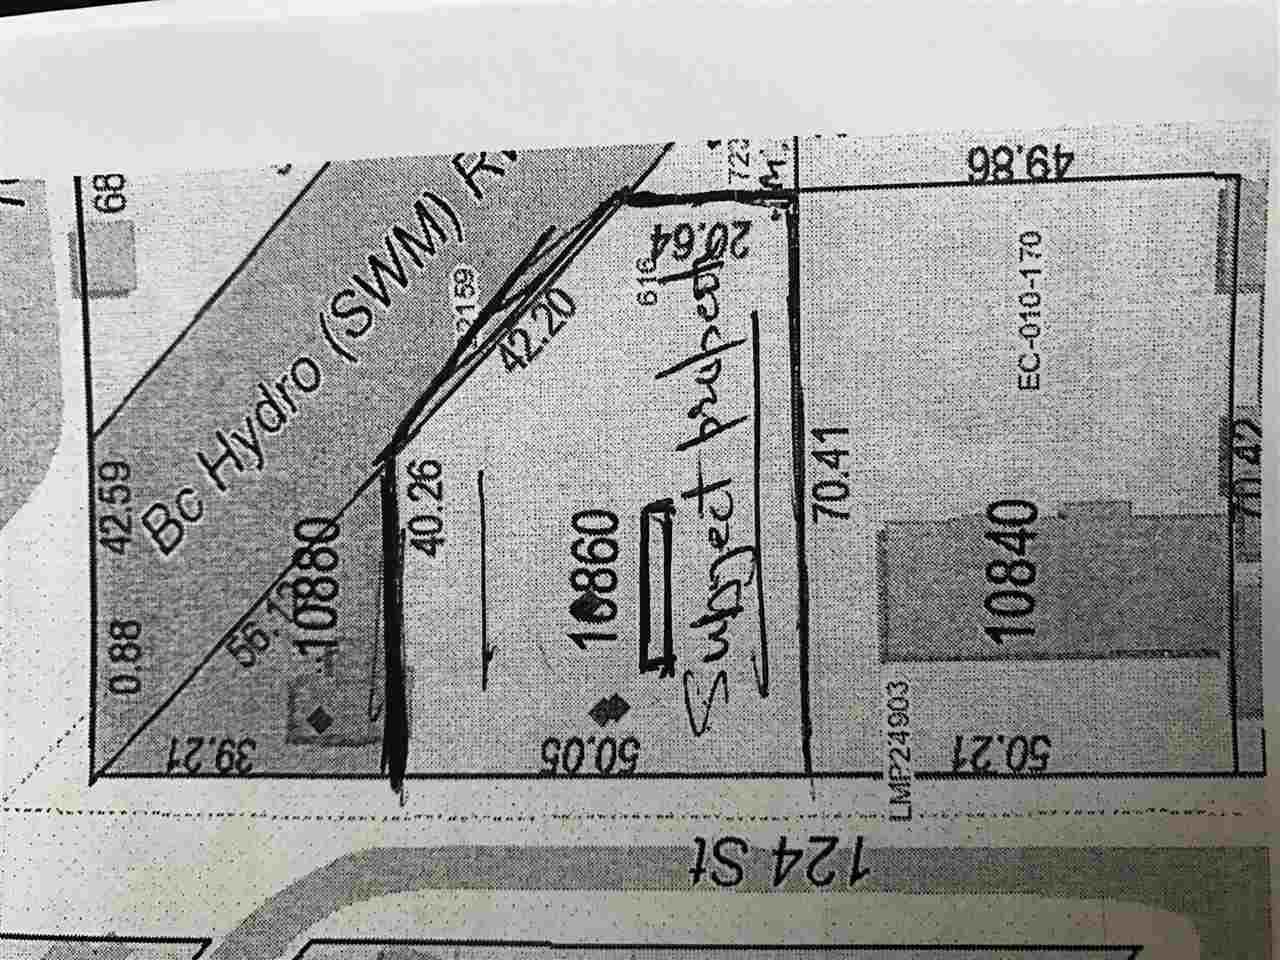 10860 124 STREET, Surrey, BC V3V 4T7